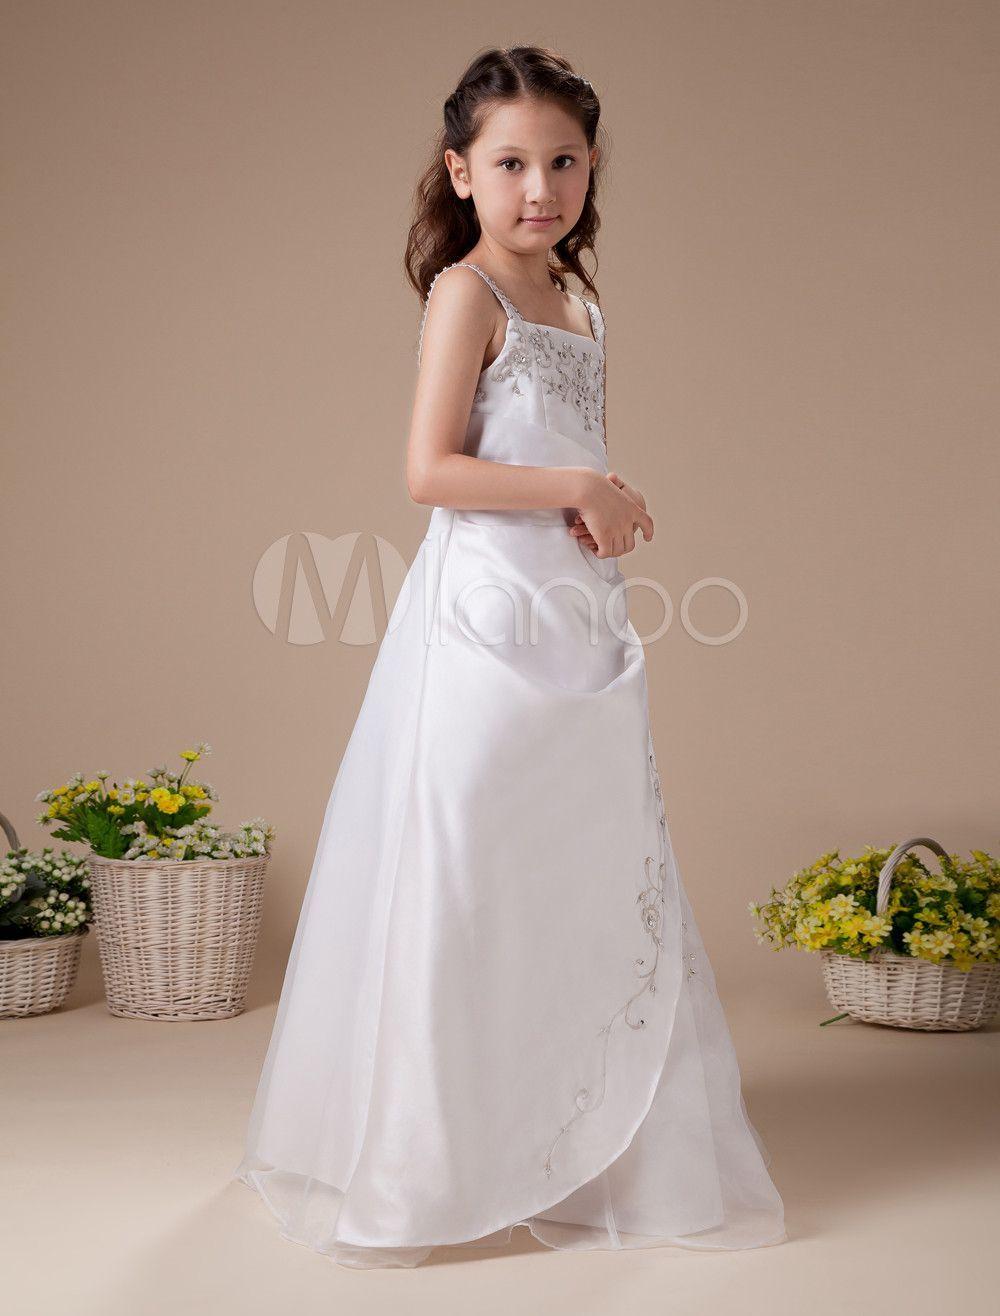 96fe5ab604b White Sleeveless Embroidery Satin Flower Girl Dress  Embroidery ...